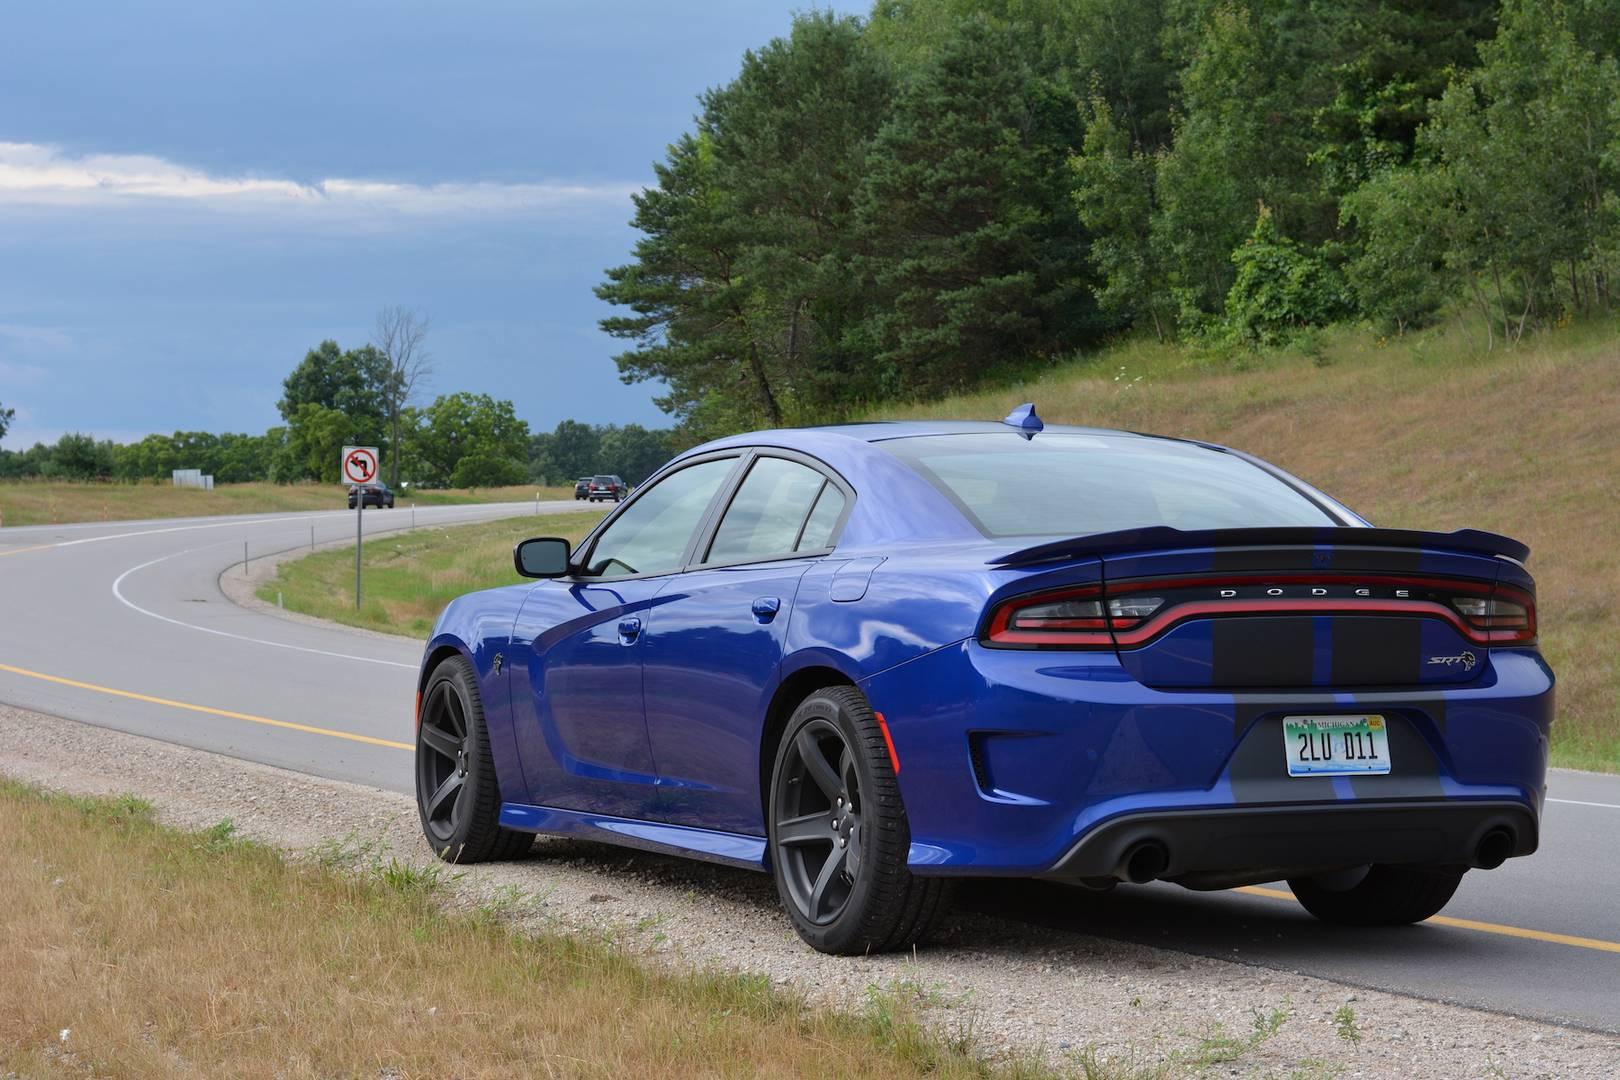 2019 Dodge Charger SRT Hellcat Review - GTspirit